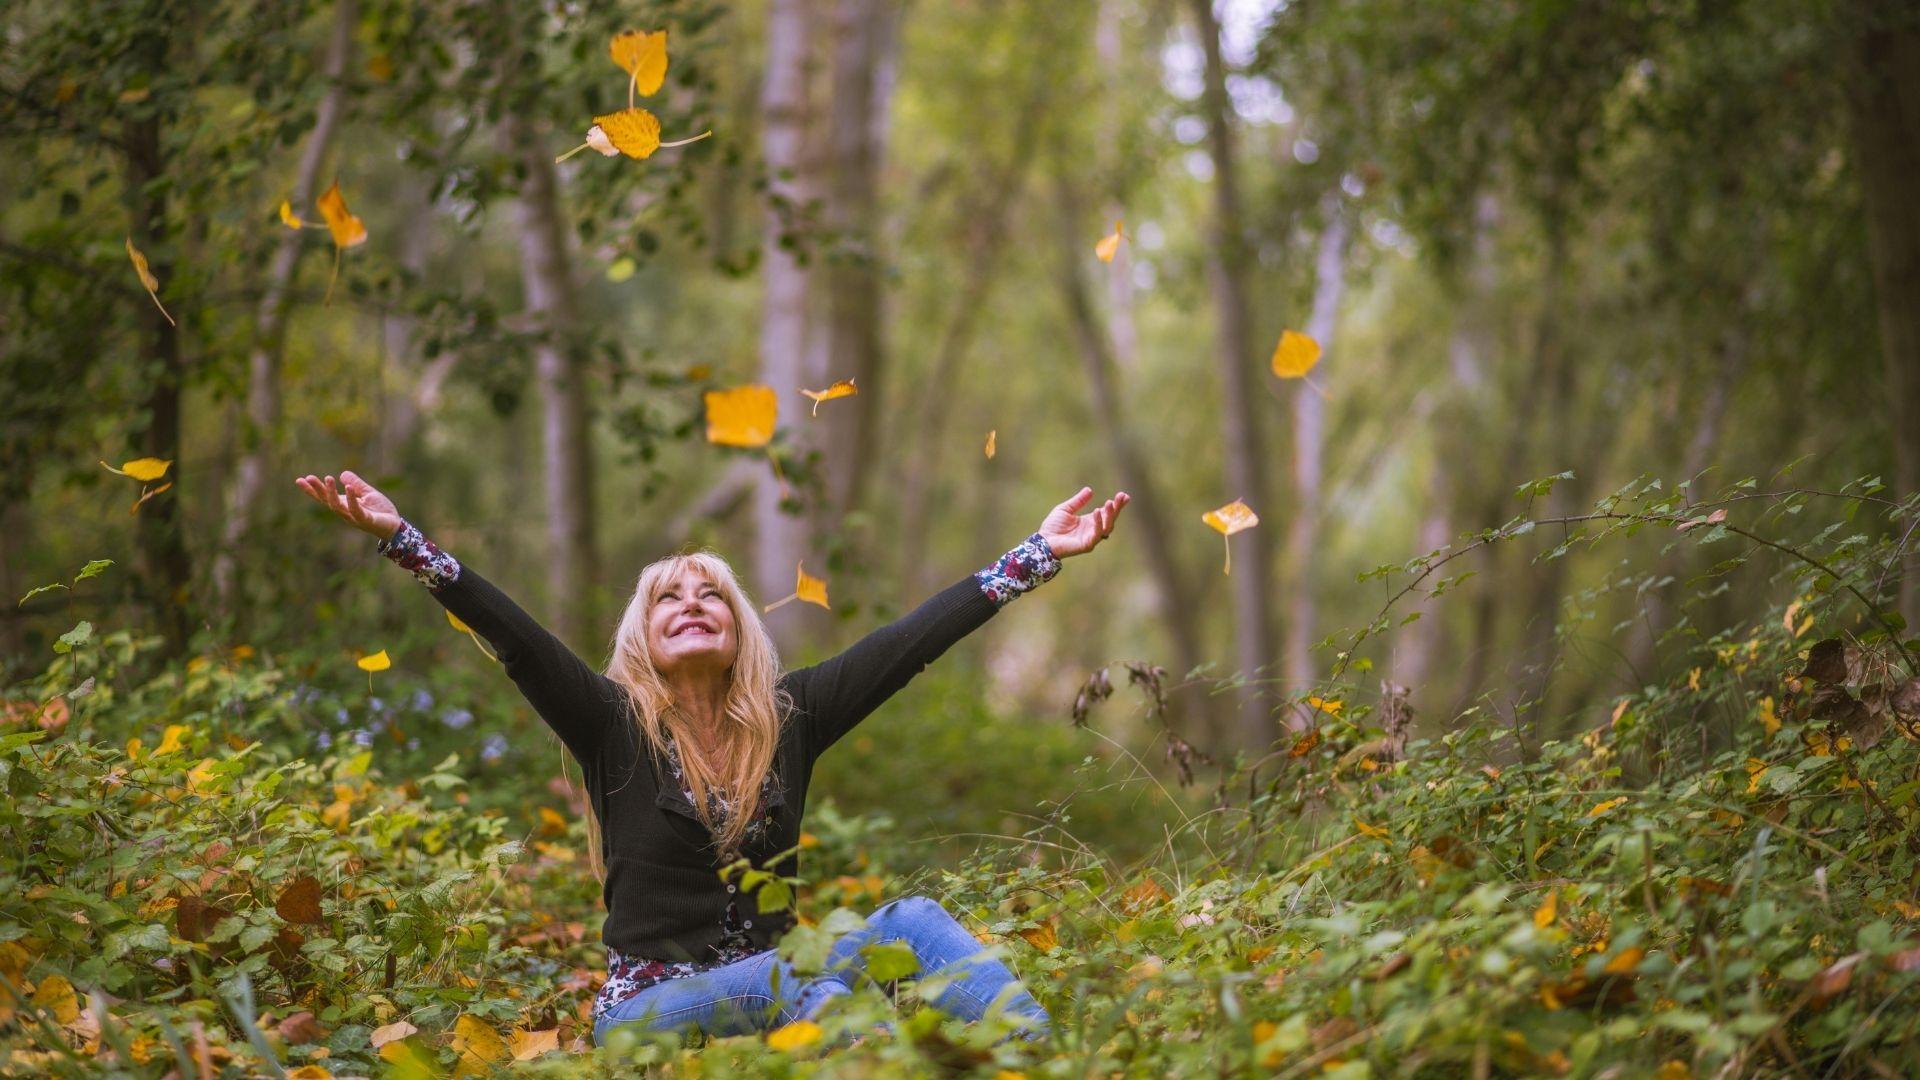 02 Herbstblues Tipps - ©www.canva.com